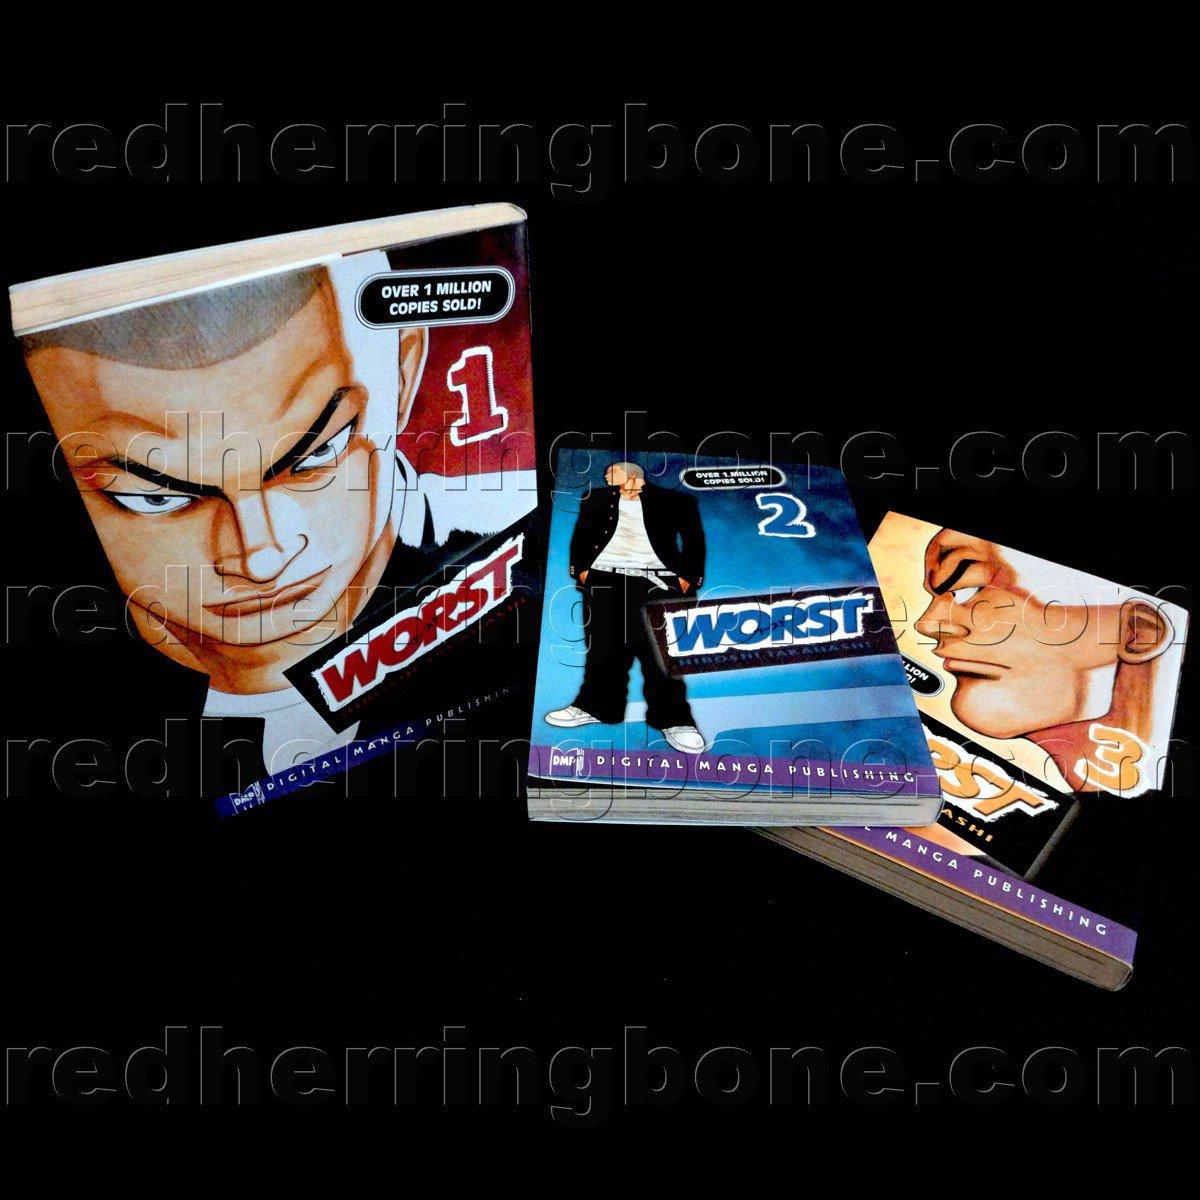 Worst, Vol. 1-3 Manga (set includes Volume 1, 2, and 3) Hiroshi Takahashi